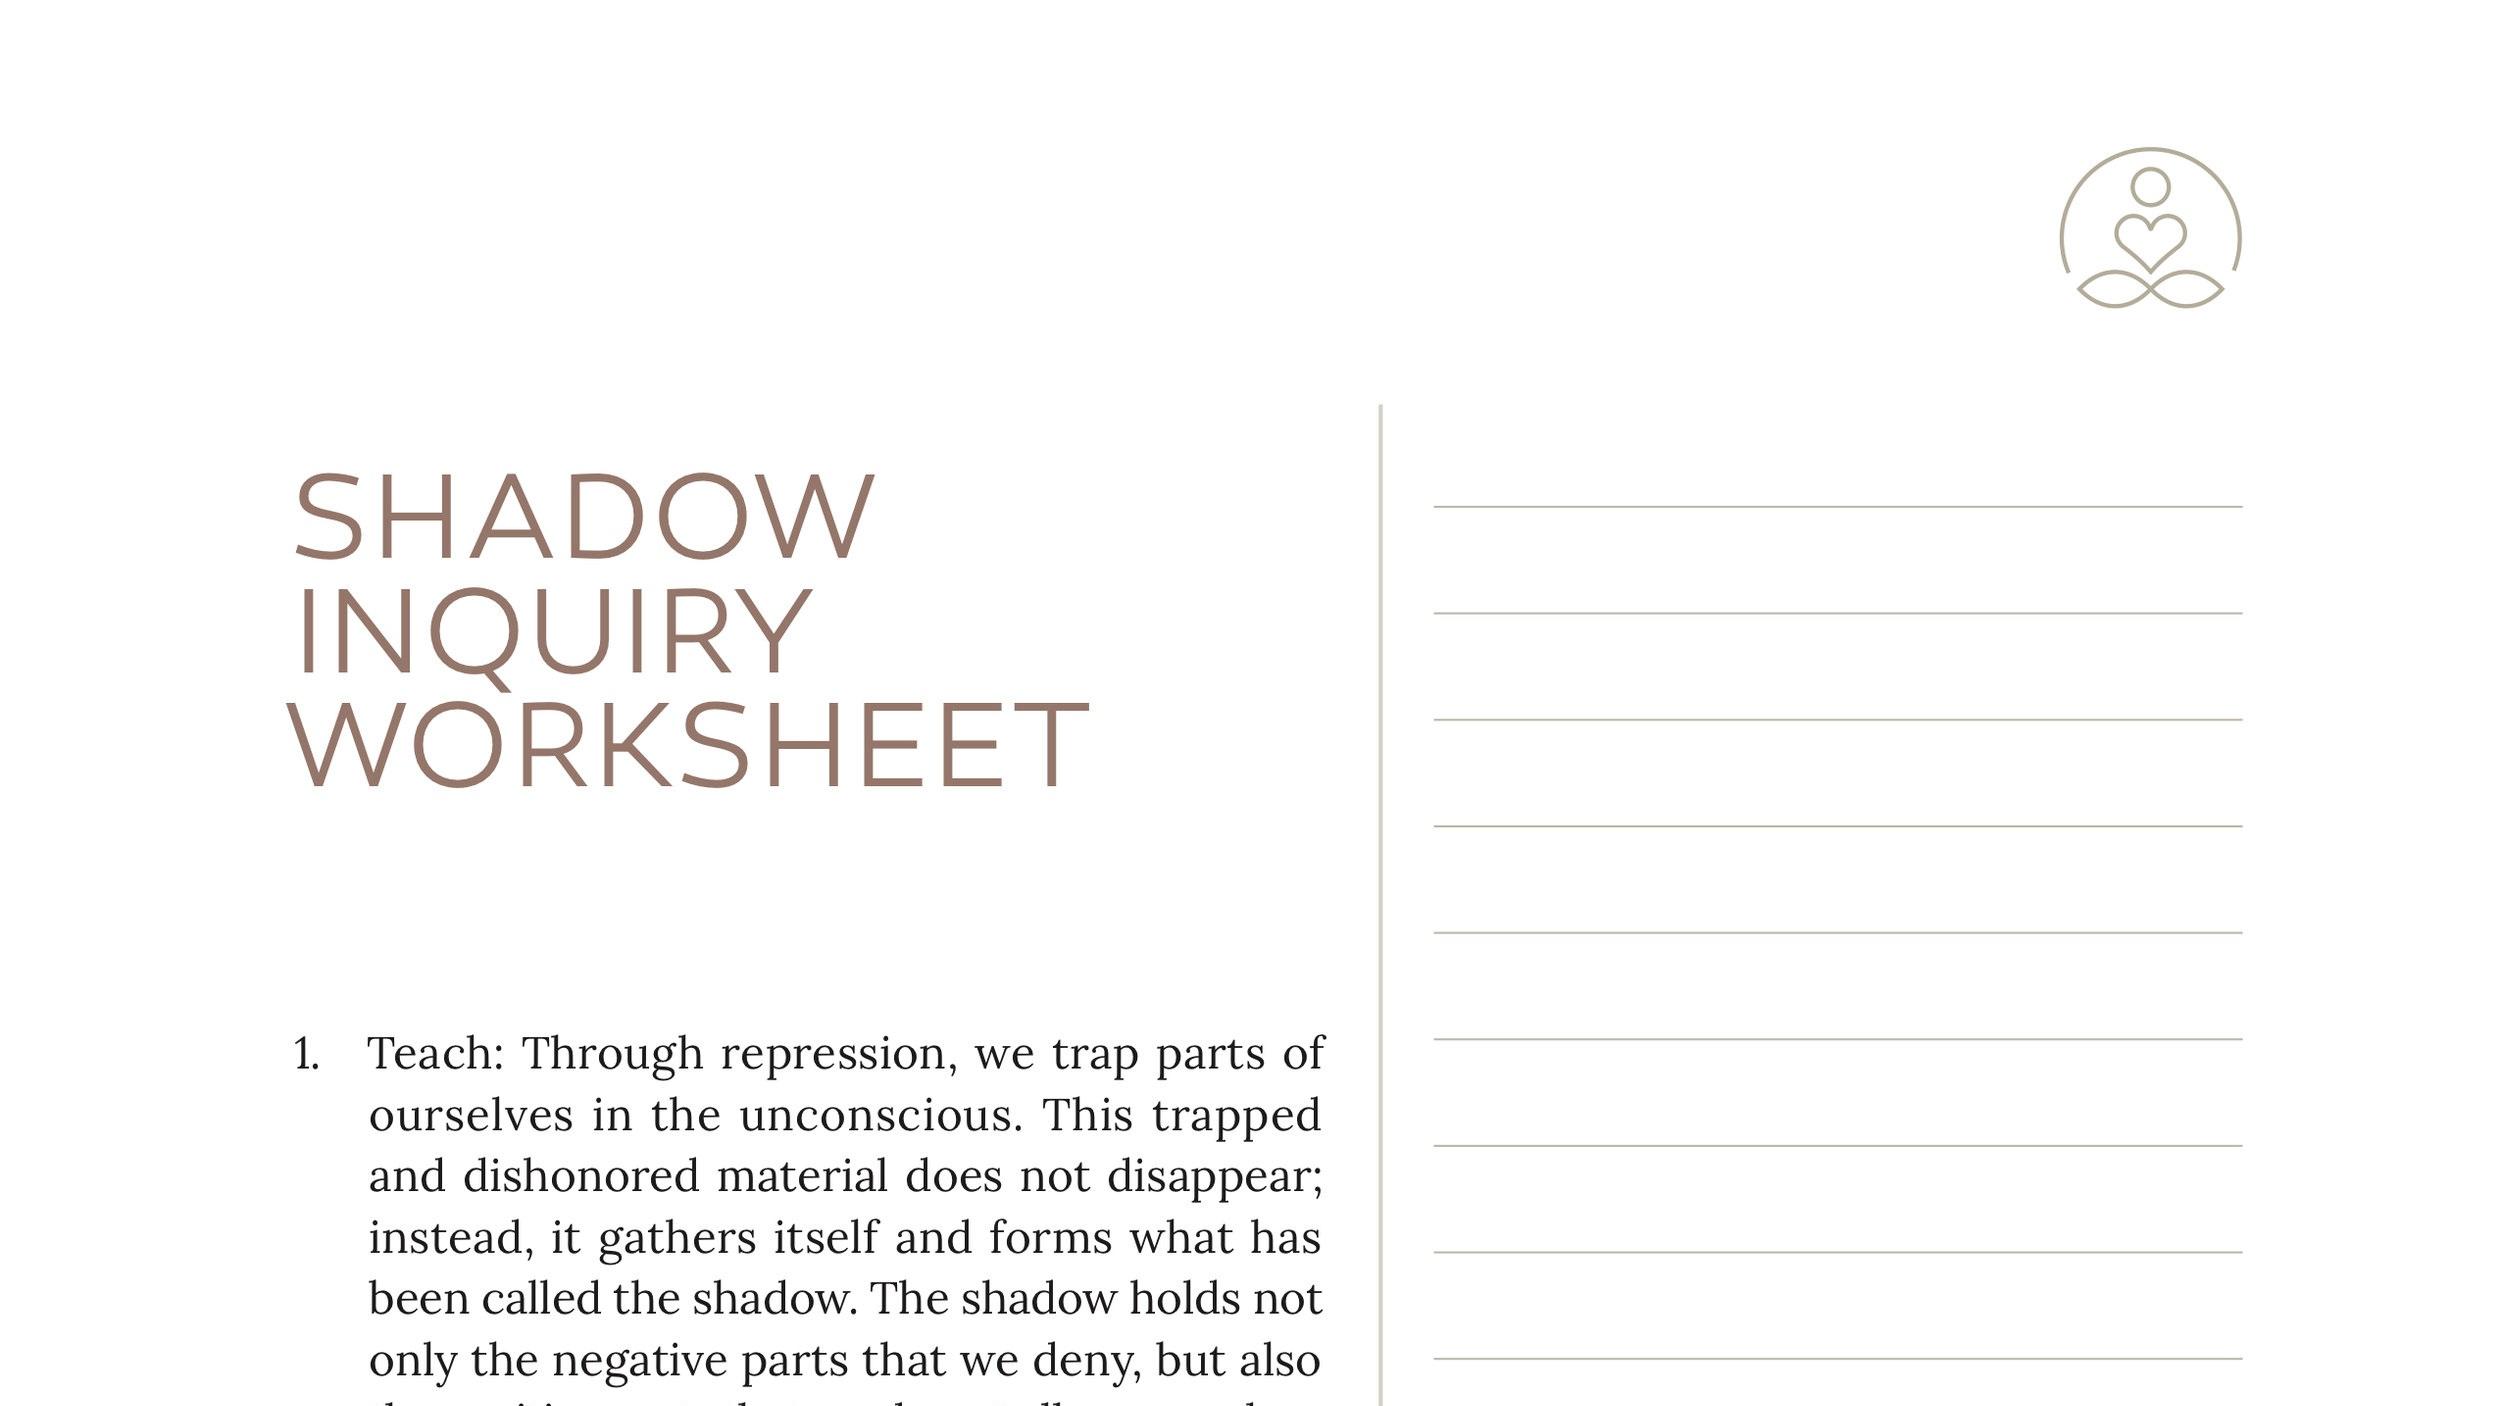 Shadow Inquiry Worksheet.jpg